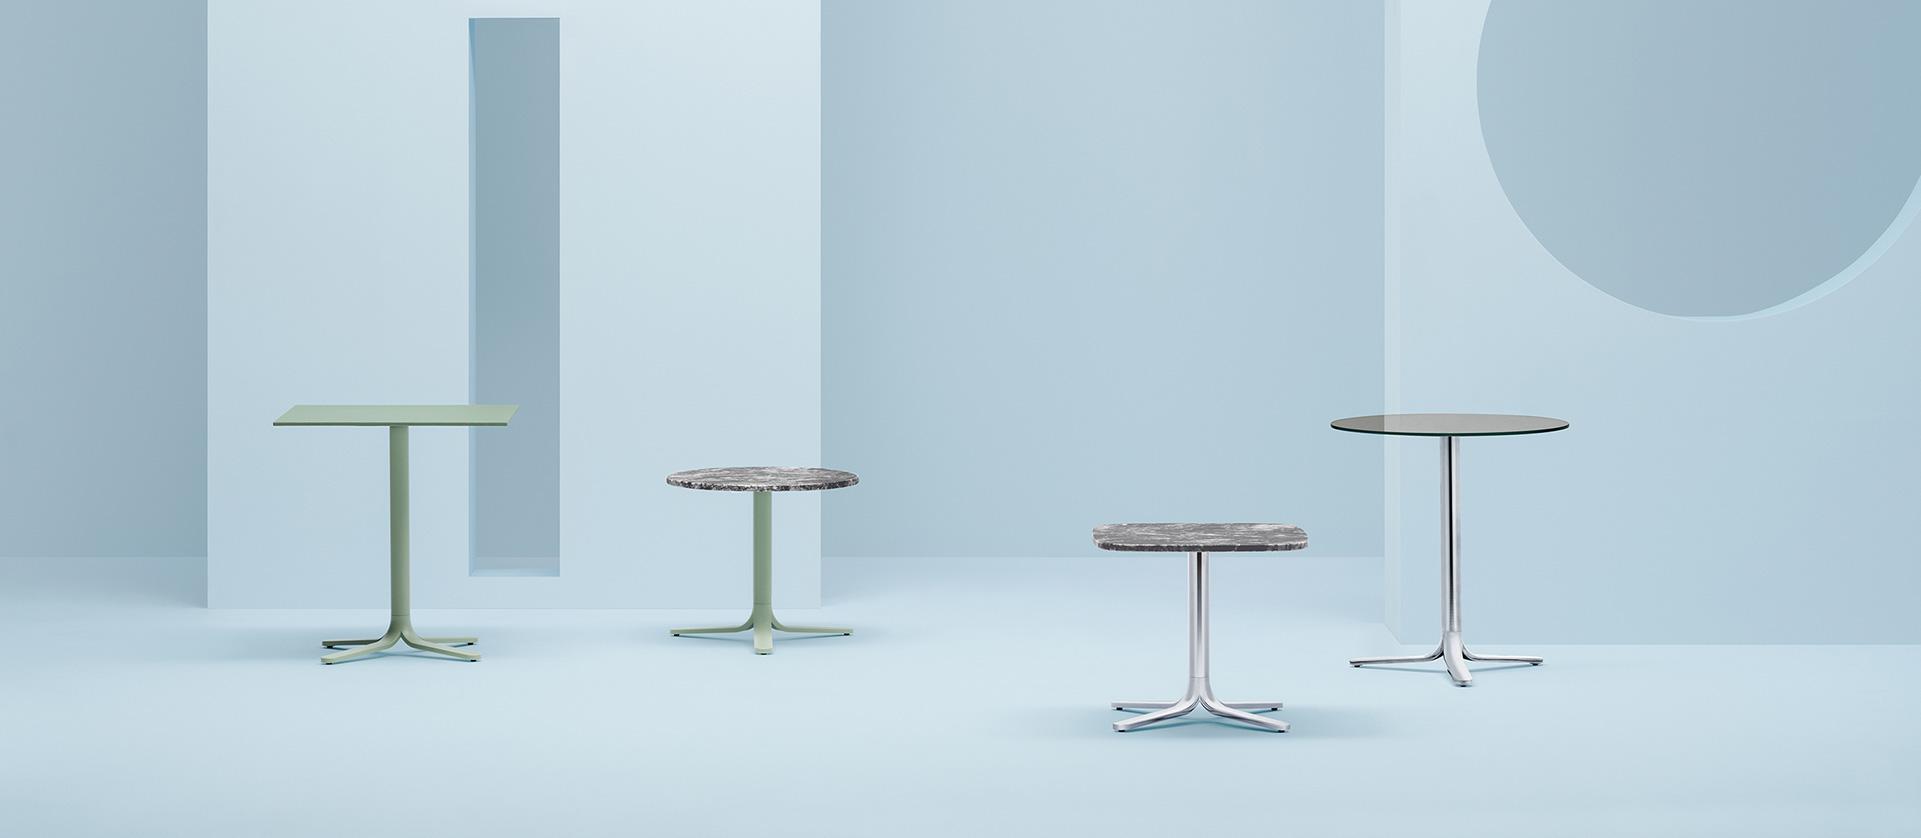 Stolik Fluxo - Producent: Pedrali, Dystrybutor: Vipservice - stolik o wszechstronnym zastosowaniu: do hoteli, restauracji, coffee point